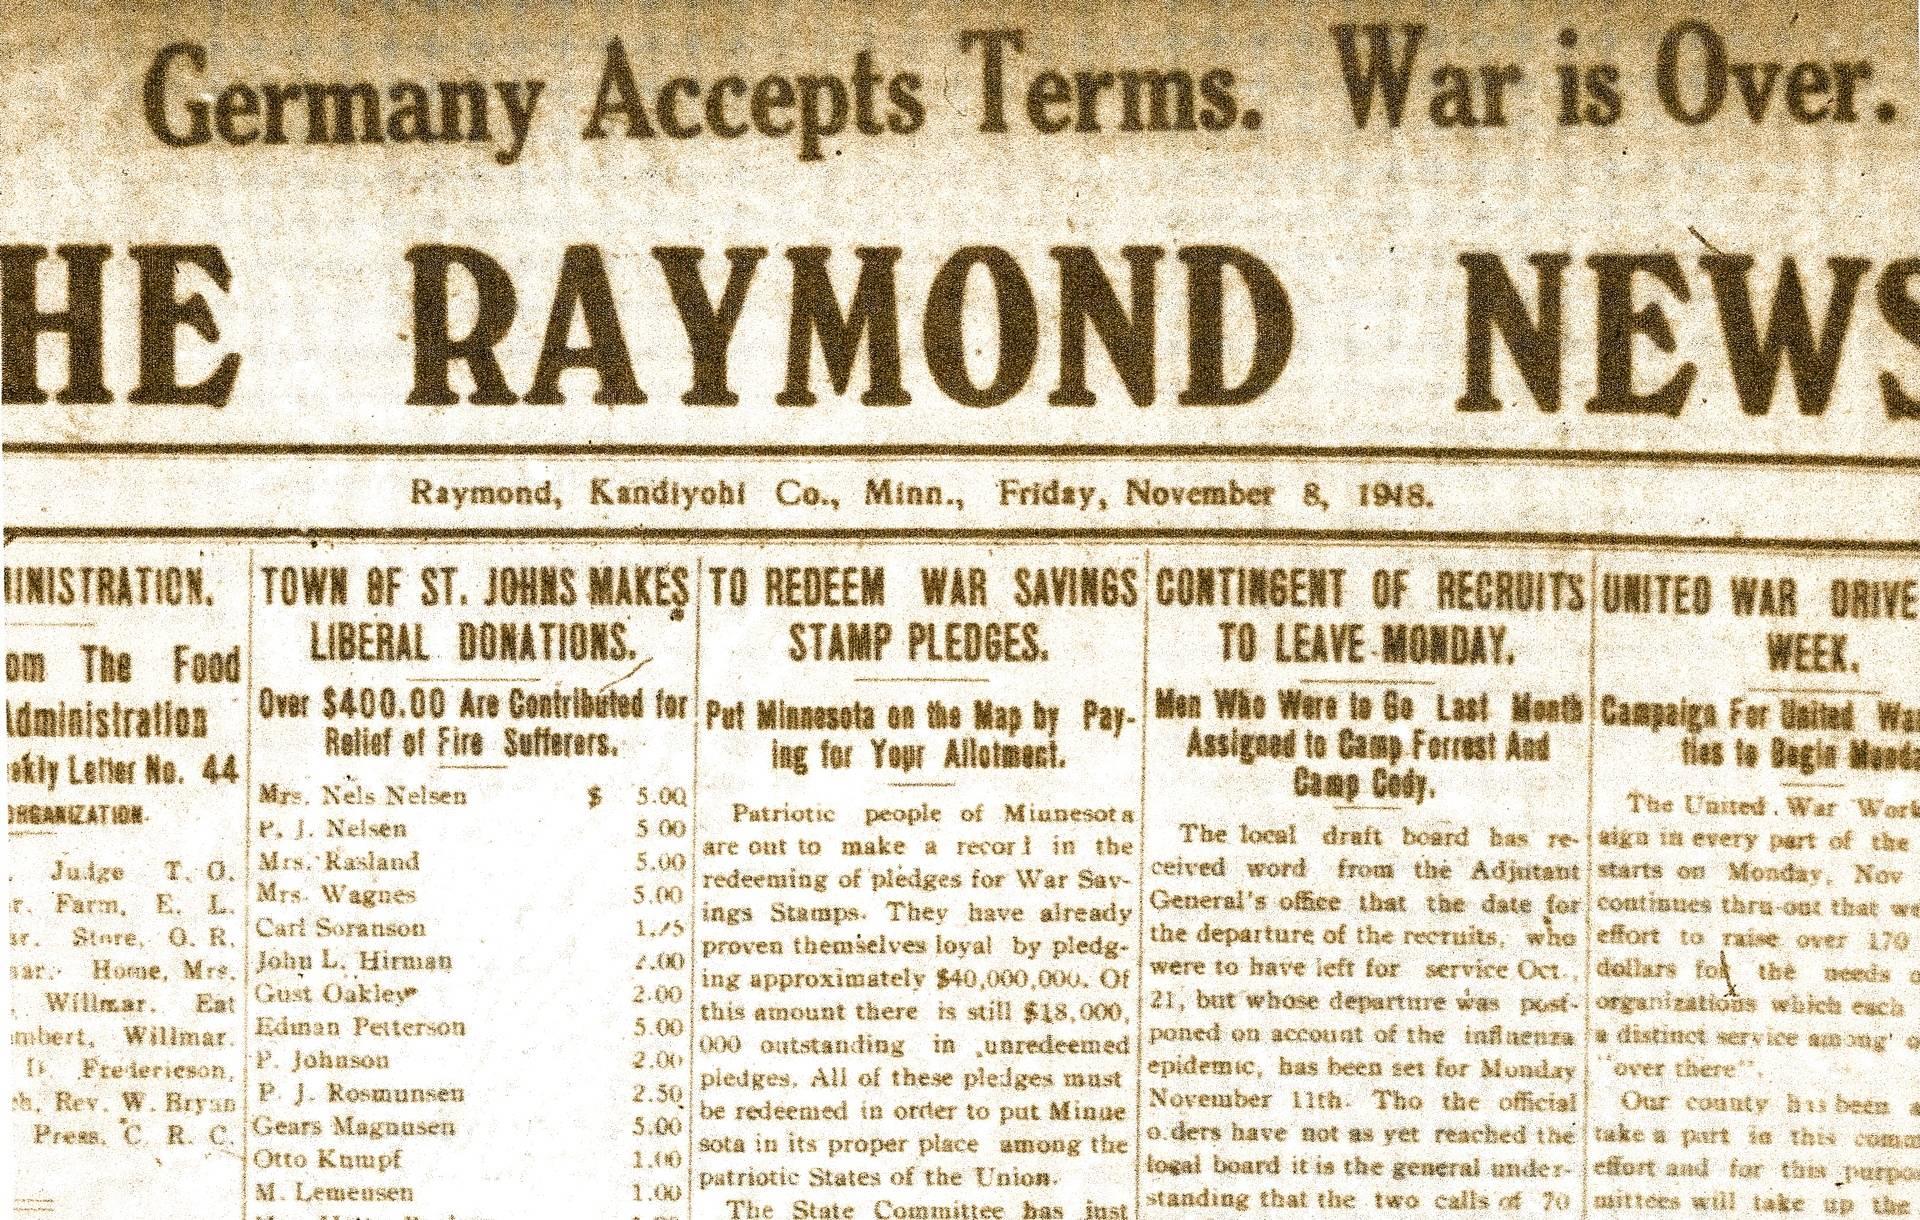 8 November 1918 Raymond News